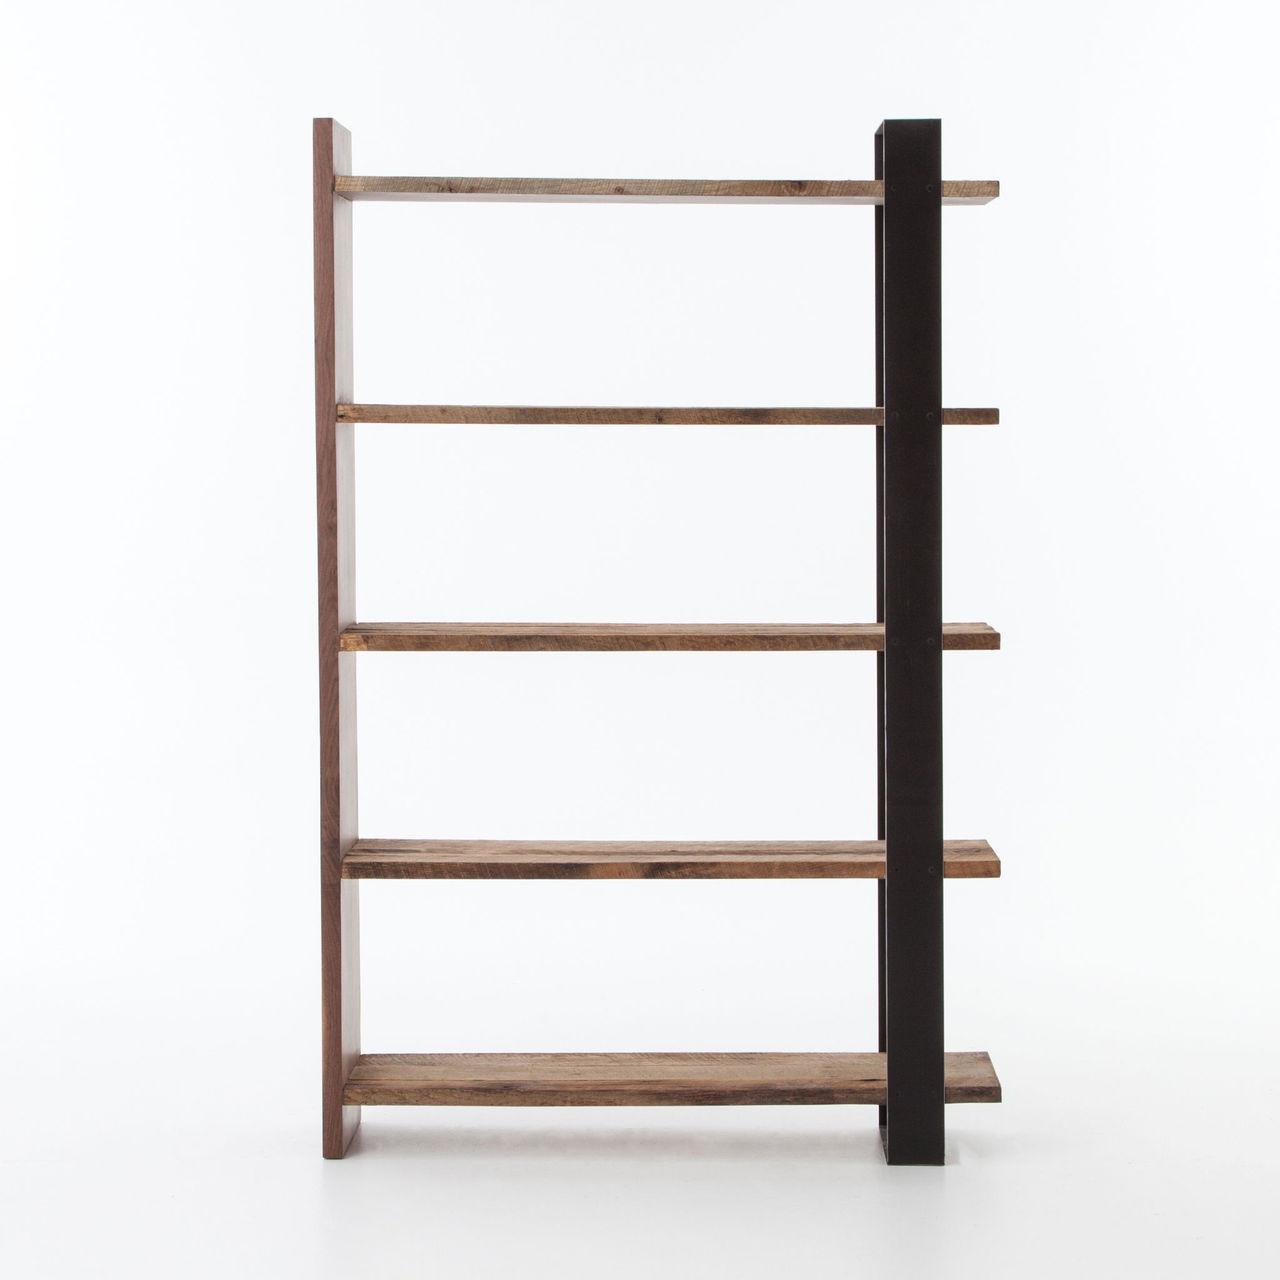 Anderson Industrial Rustic Oak Wood and Metal Bookcase | Zin Home